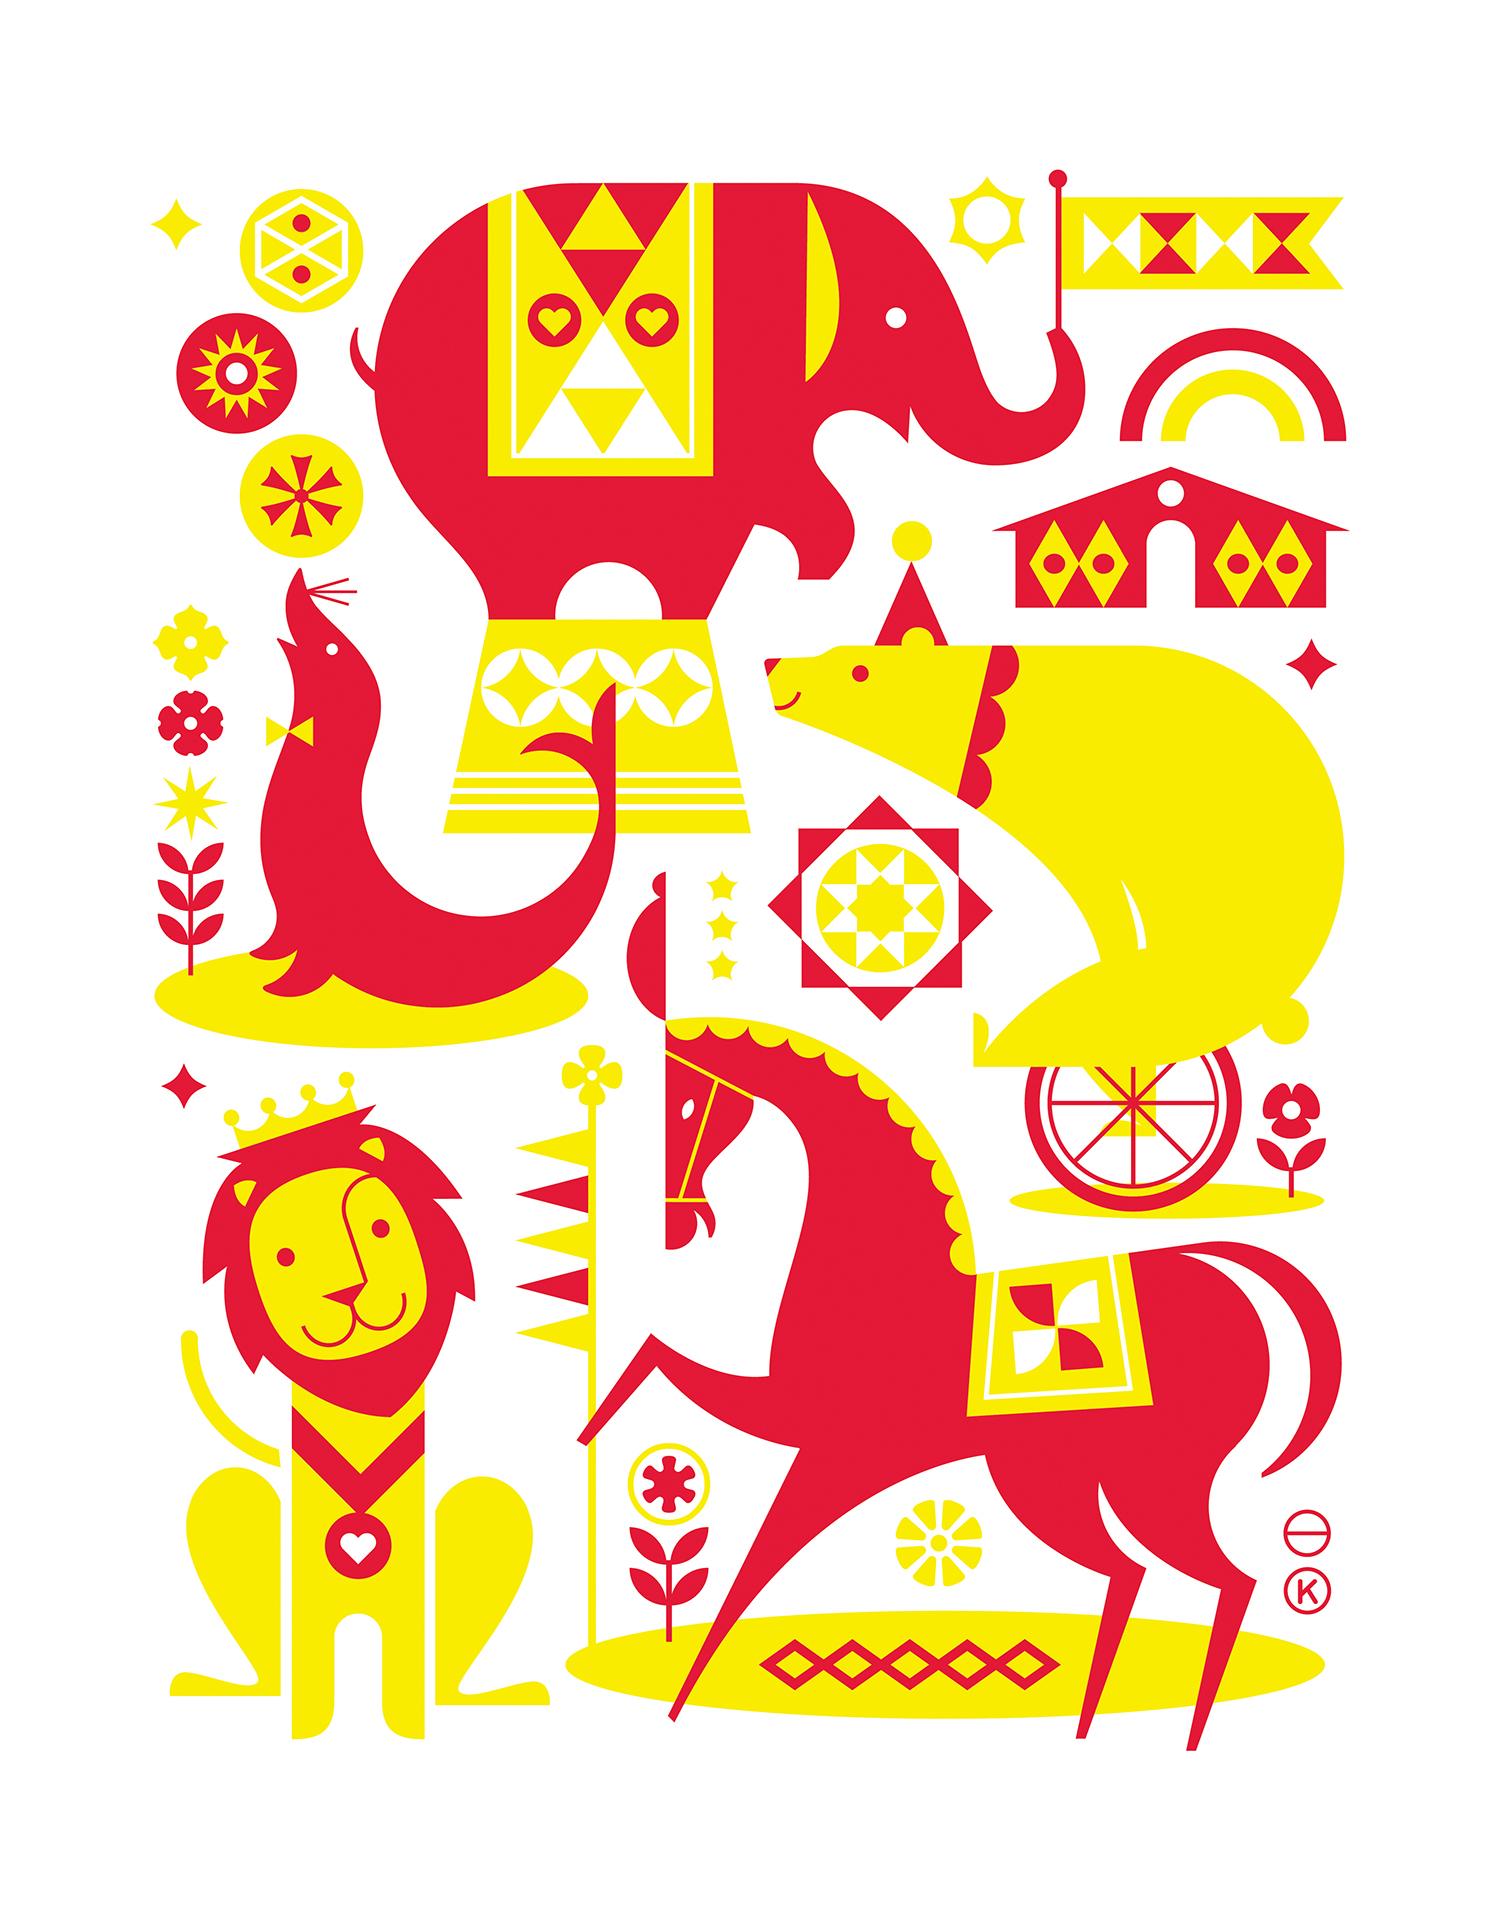 'Circus' by Katie Kirk